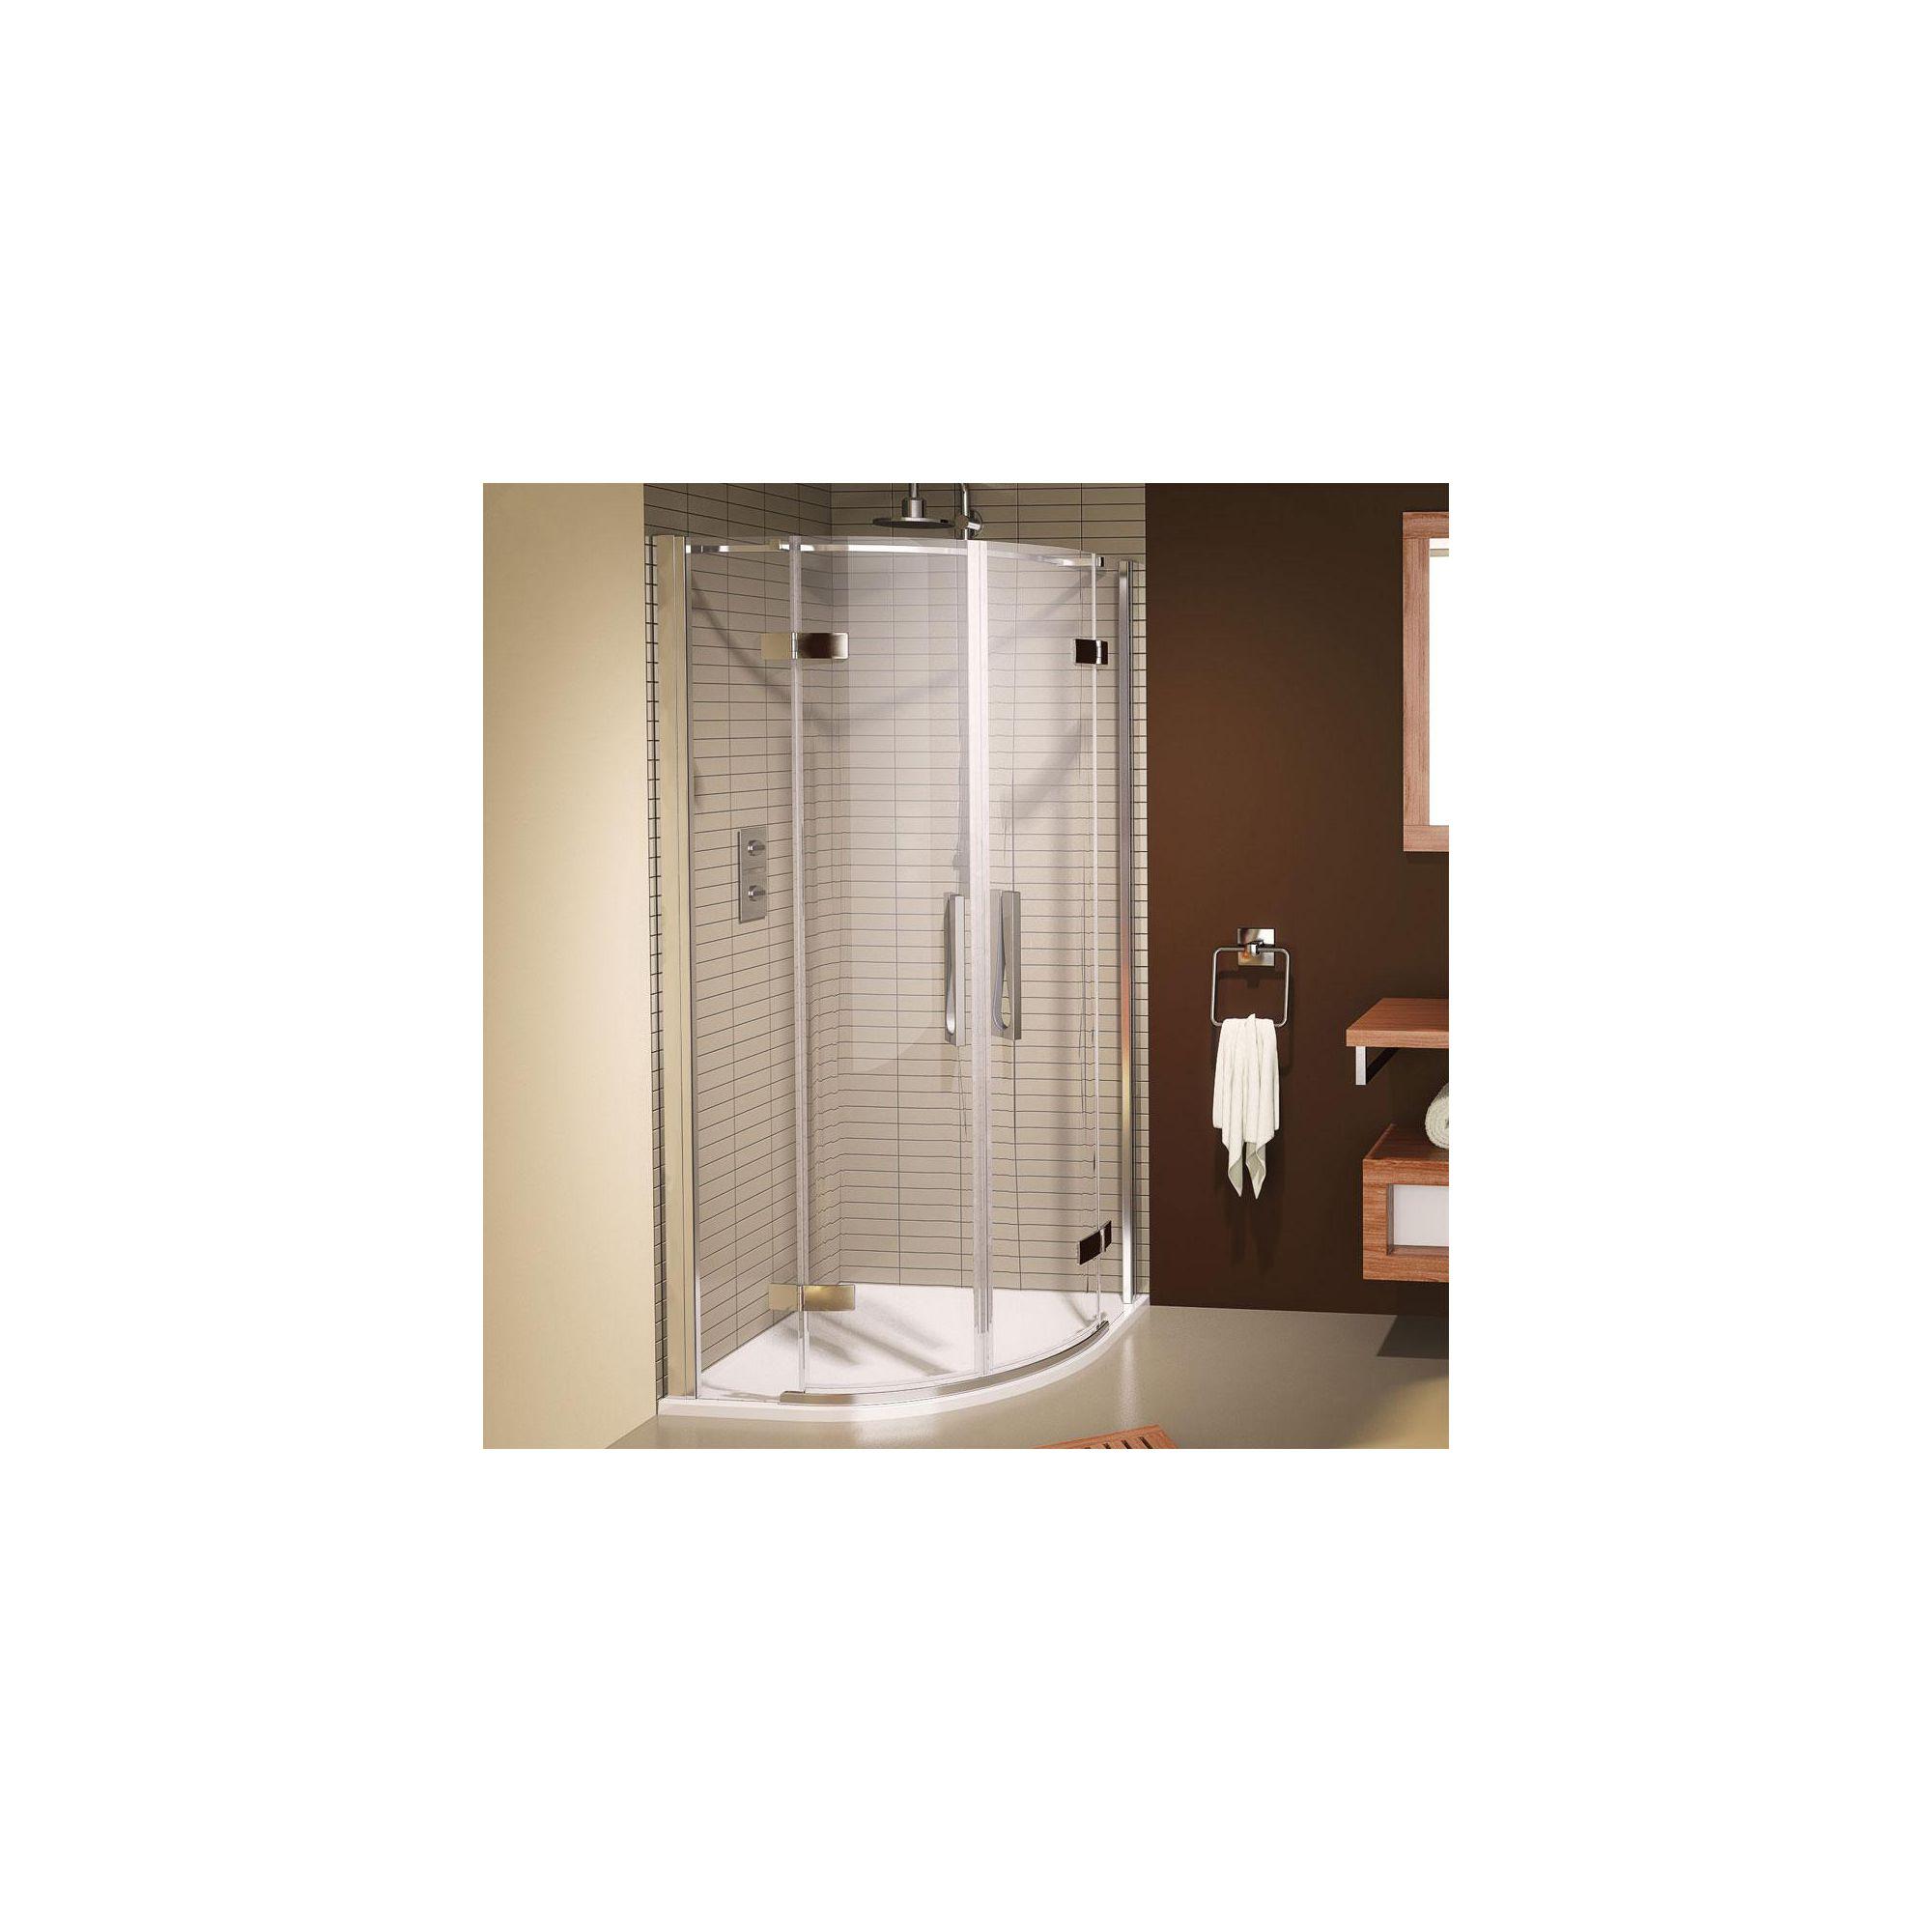 Aqualux AQUA8 Hinge Quadrant Shower Door, 900mm x 900mm, Polished Silver Frame, 8mm Glass at Tesco Direct